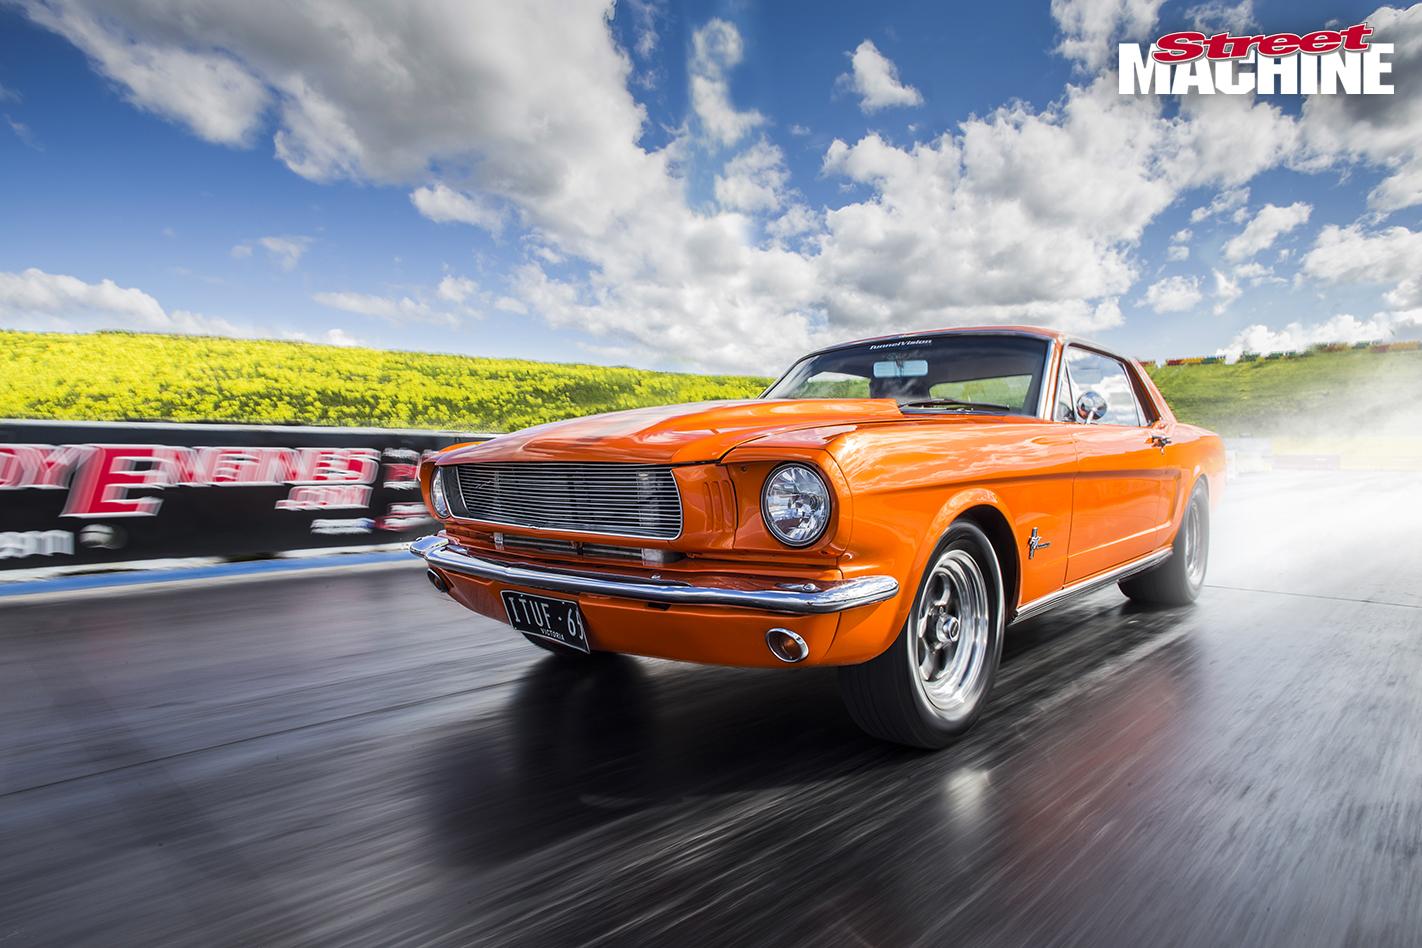 Turbo Six 1965 Mustang